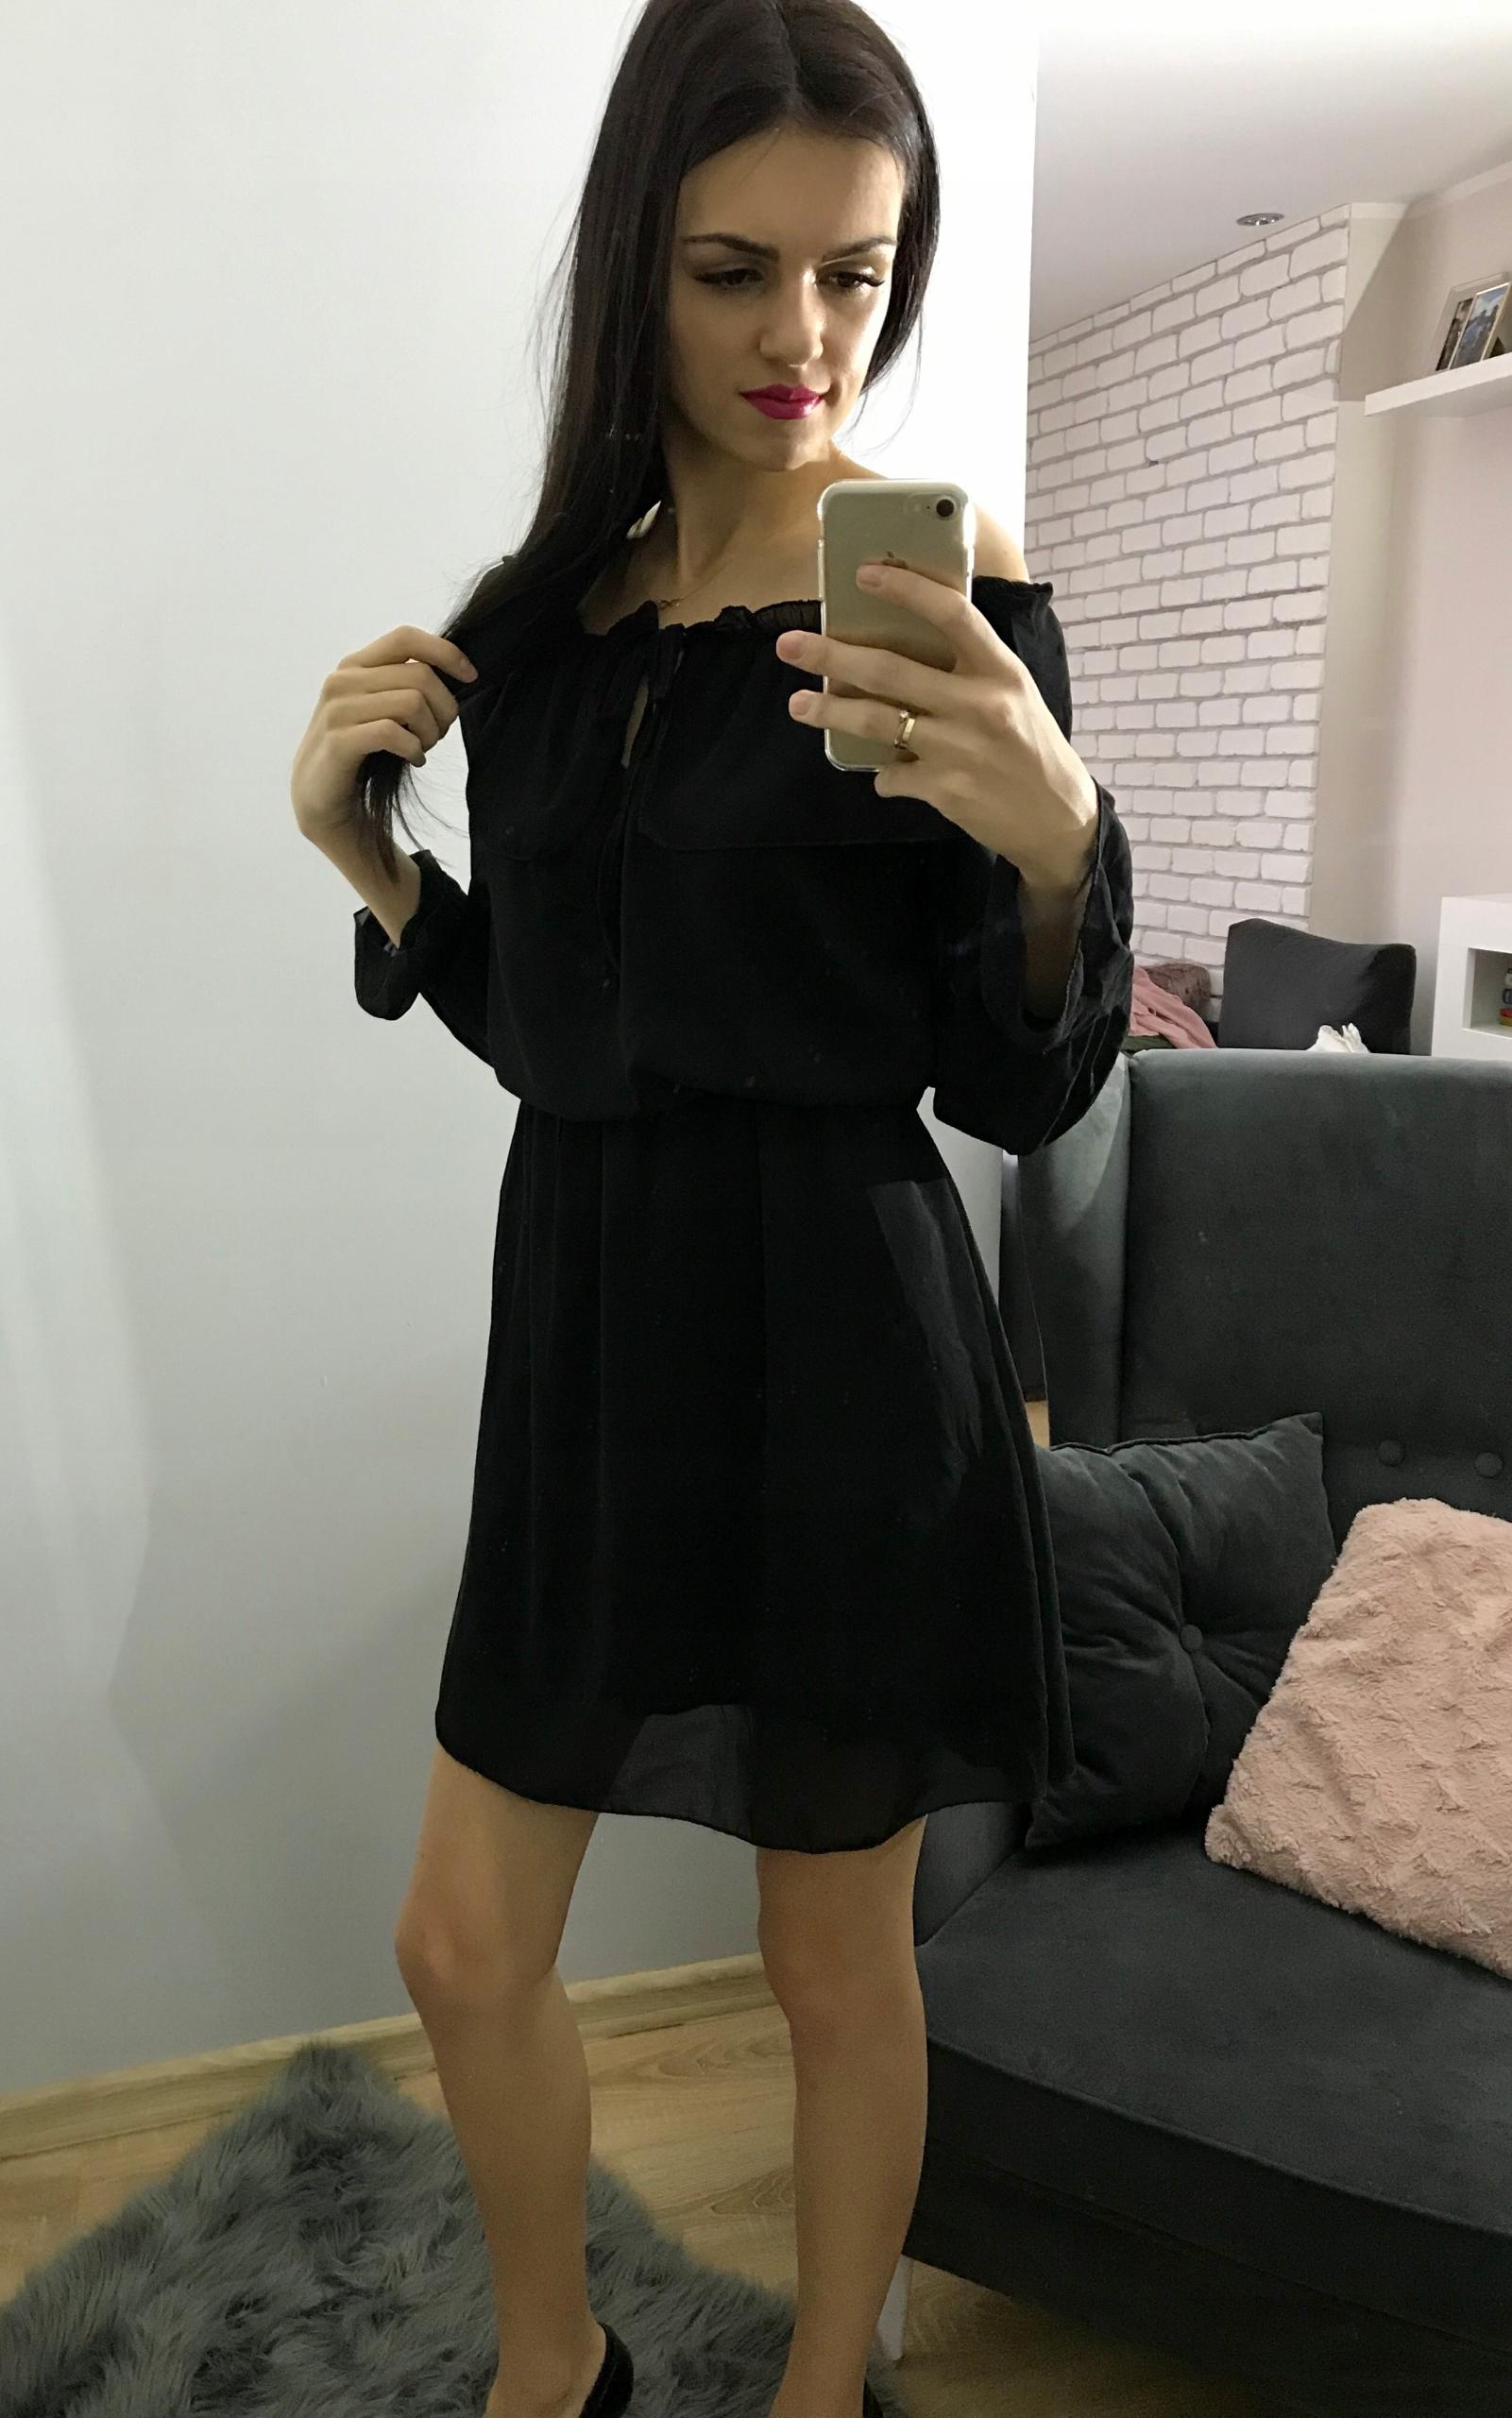 sukienka damska mozliwosc karmienia julia eleganck